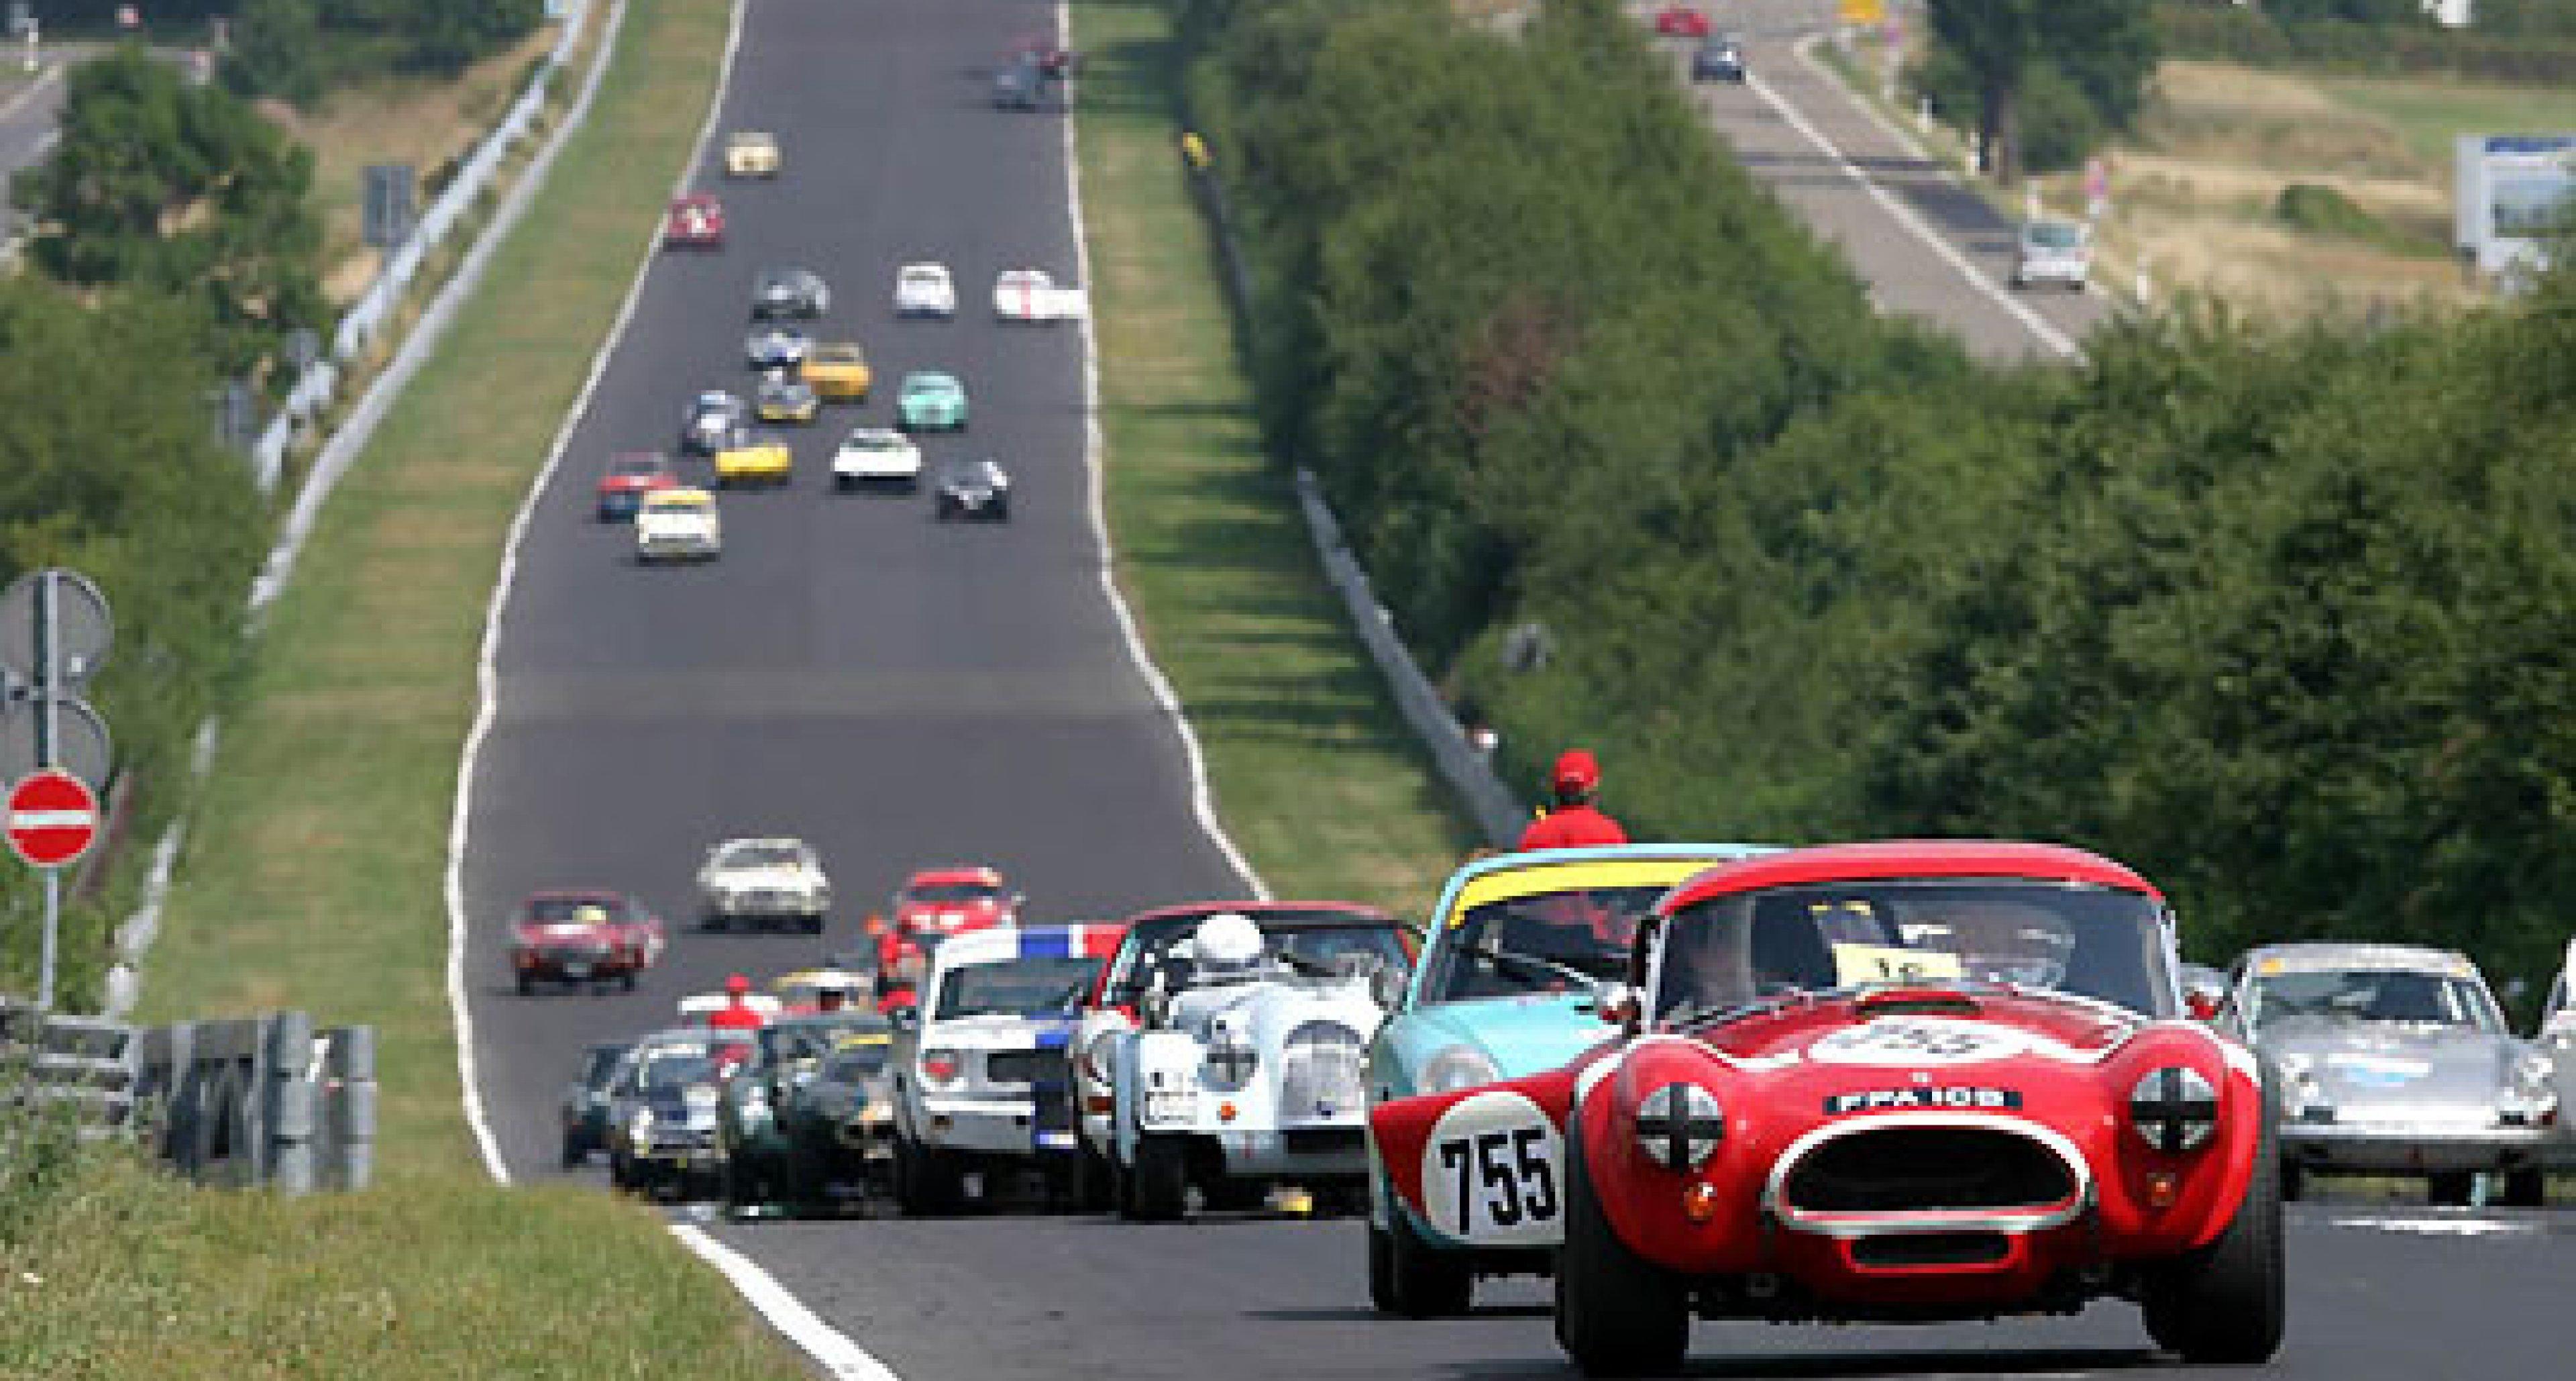 Starterfeld der Superlative beim 32. AvD-Oldtimer-Grand-Prix